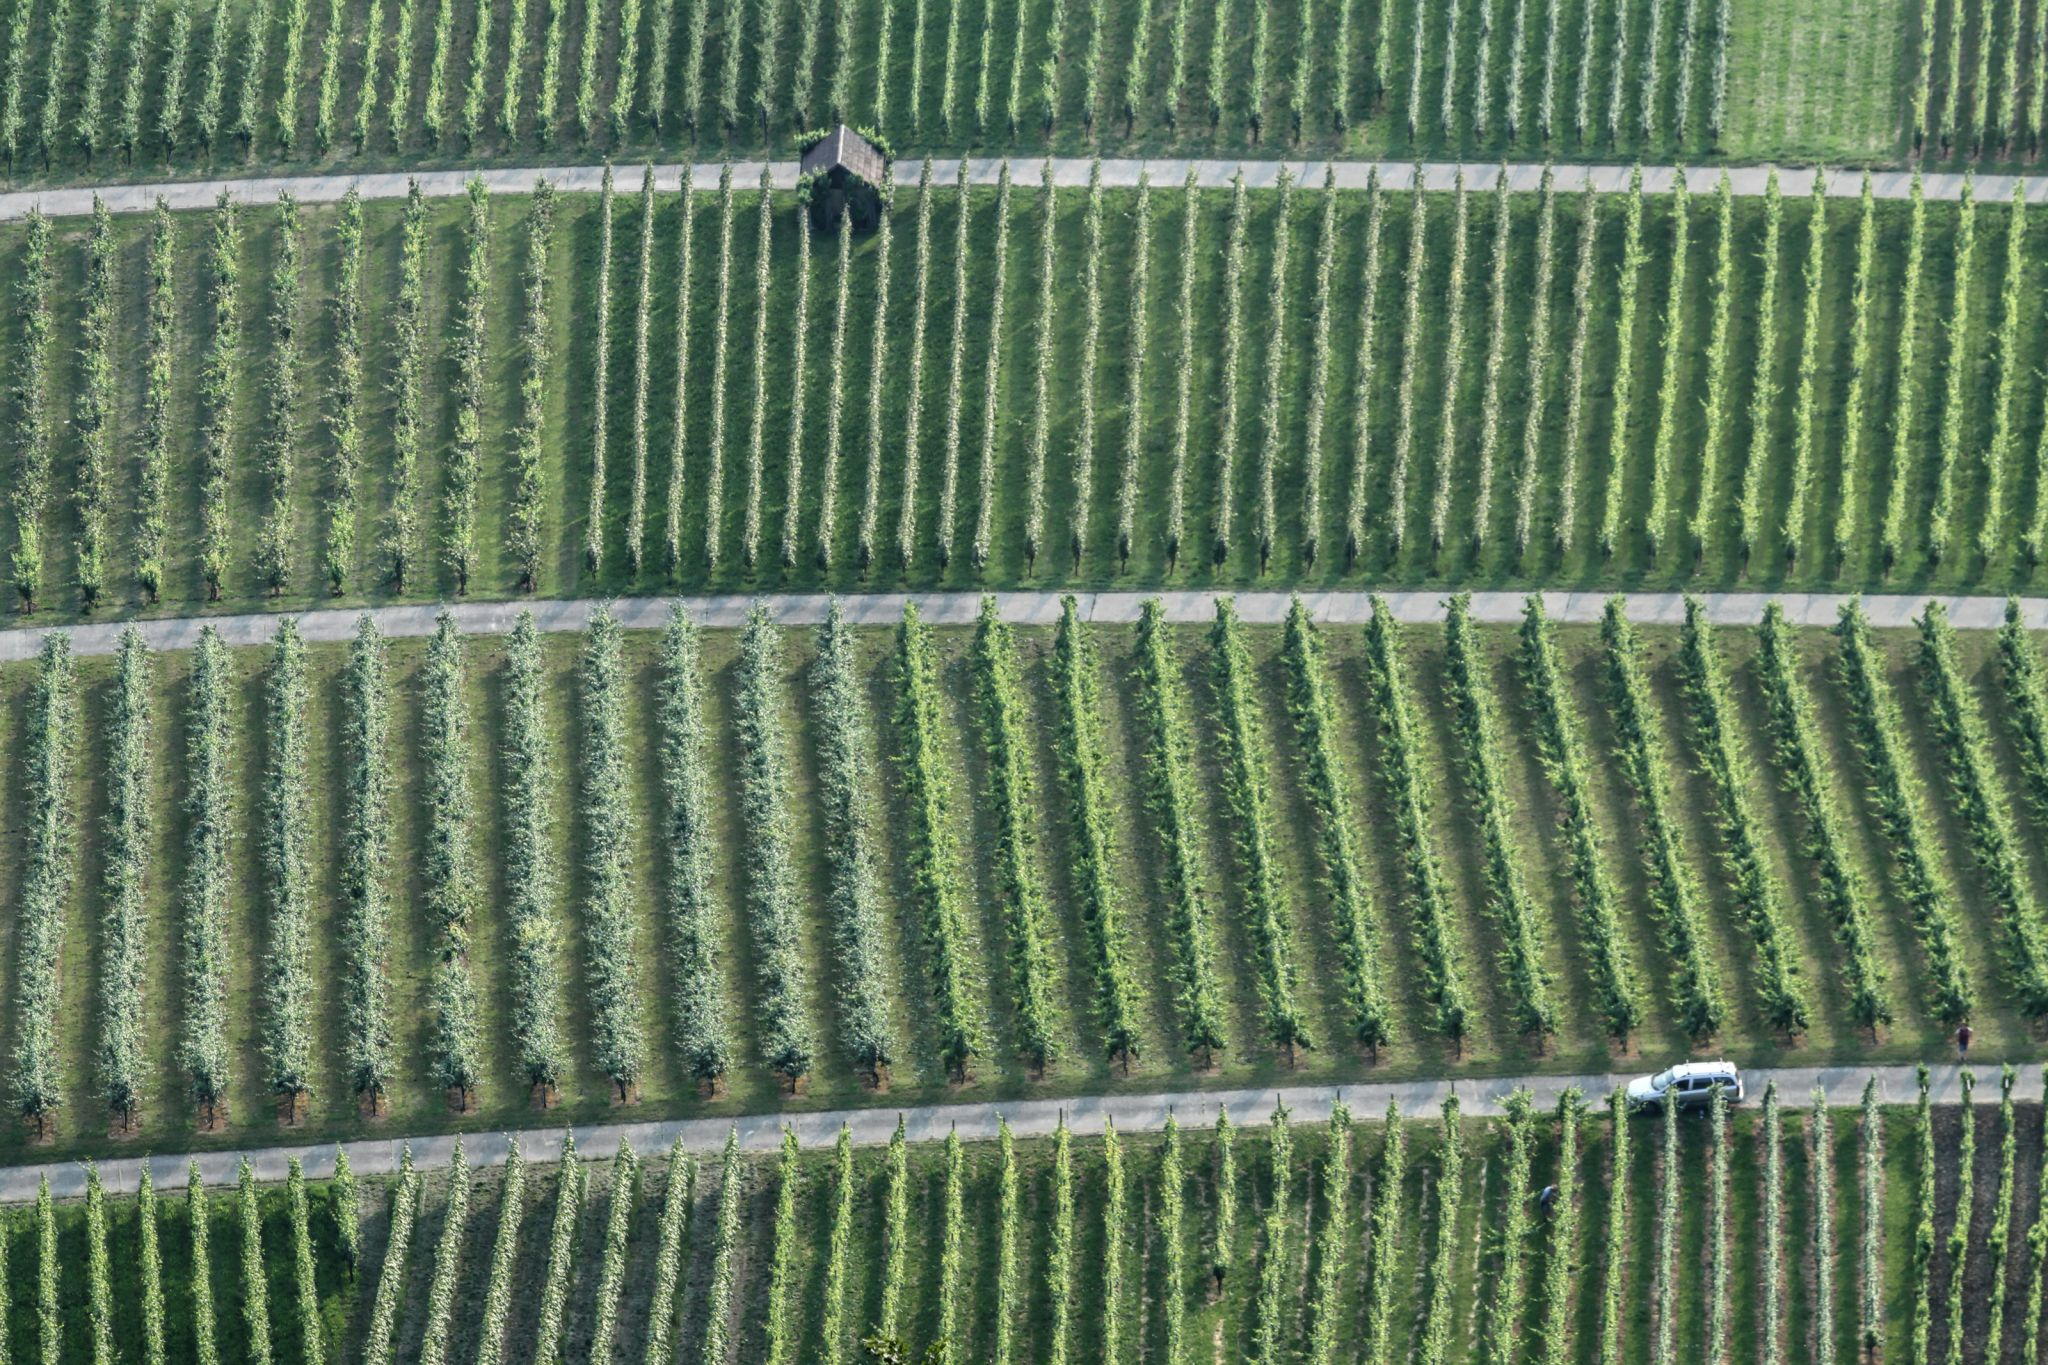 Vineyards, Hohenneuffen, Germany